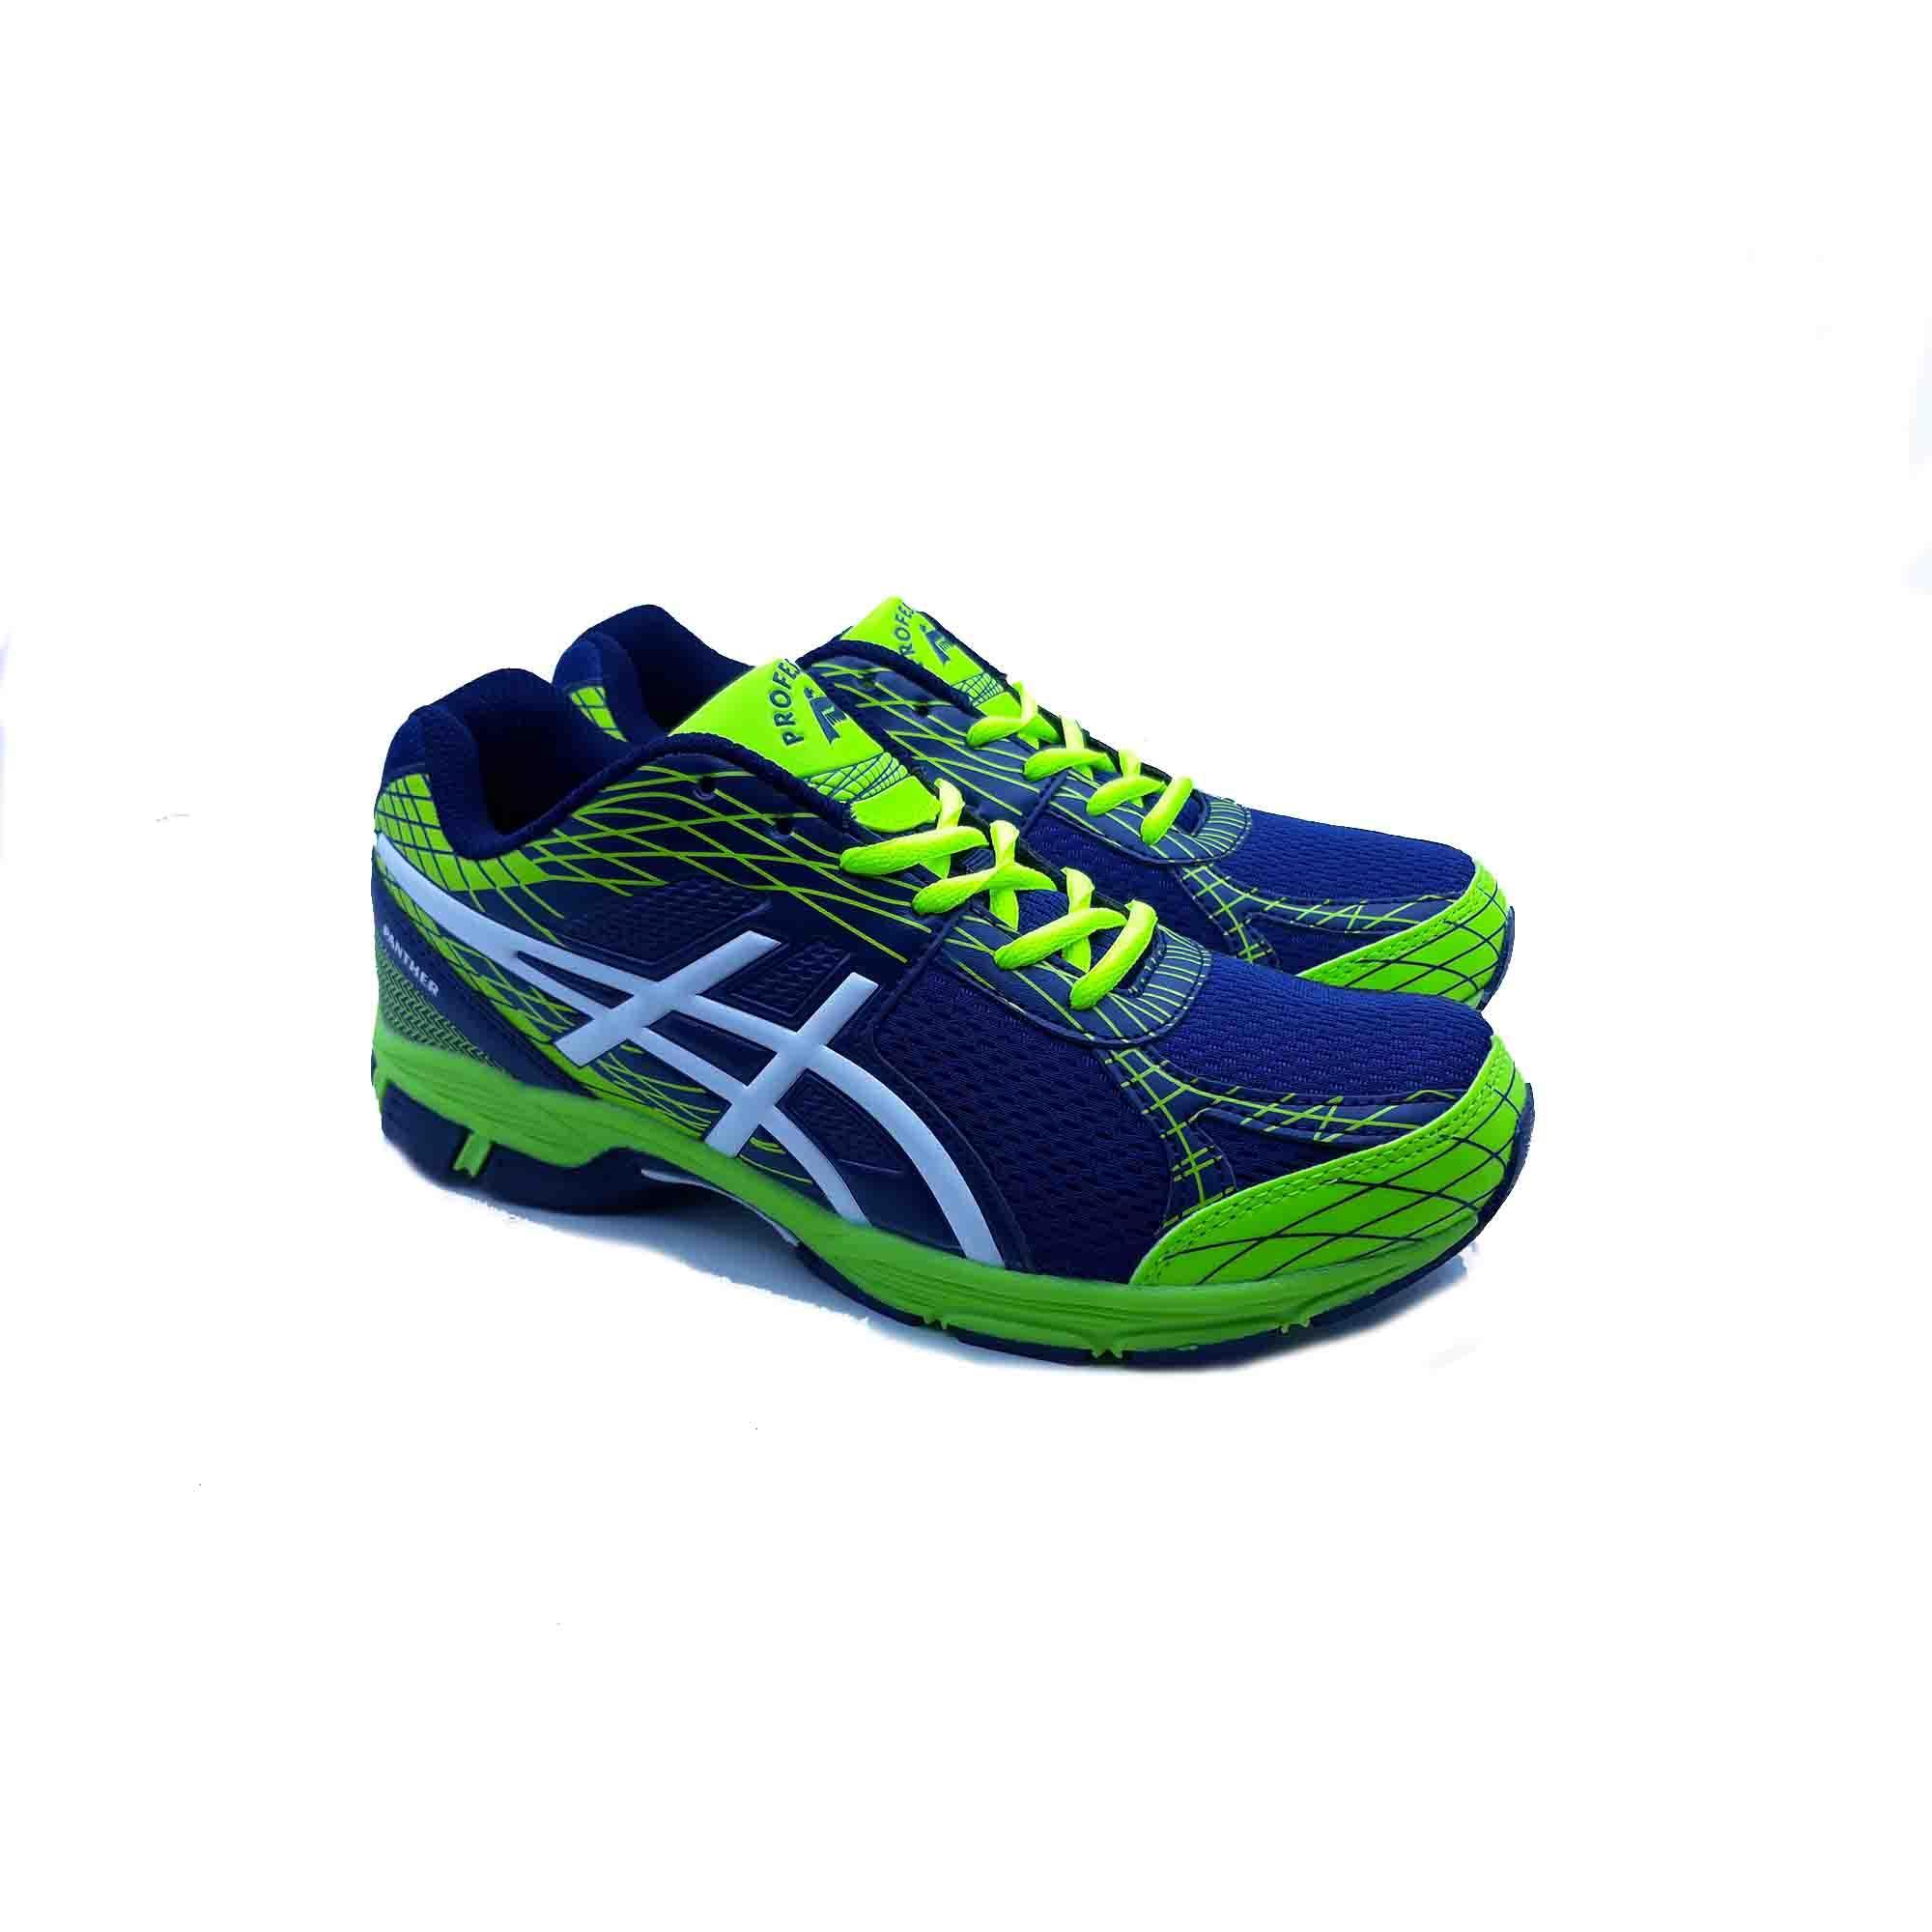 Sepatu Olahraga Pria Running Profesional Panther - Navy Neon Grenn White c9f28987a4